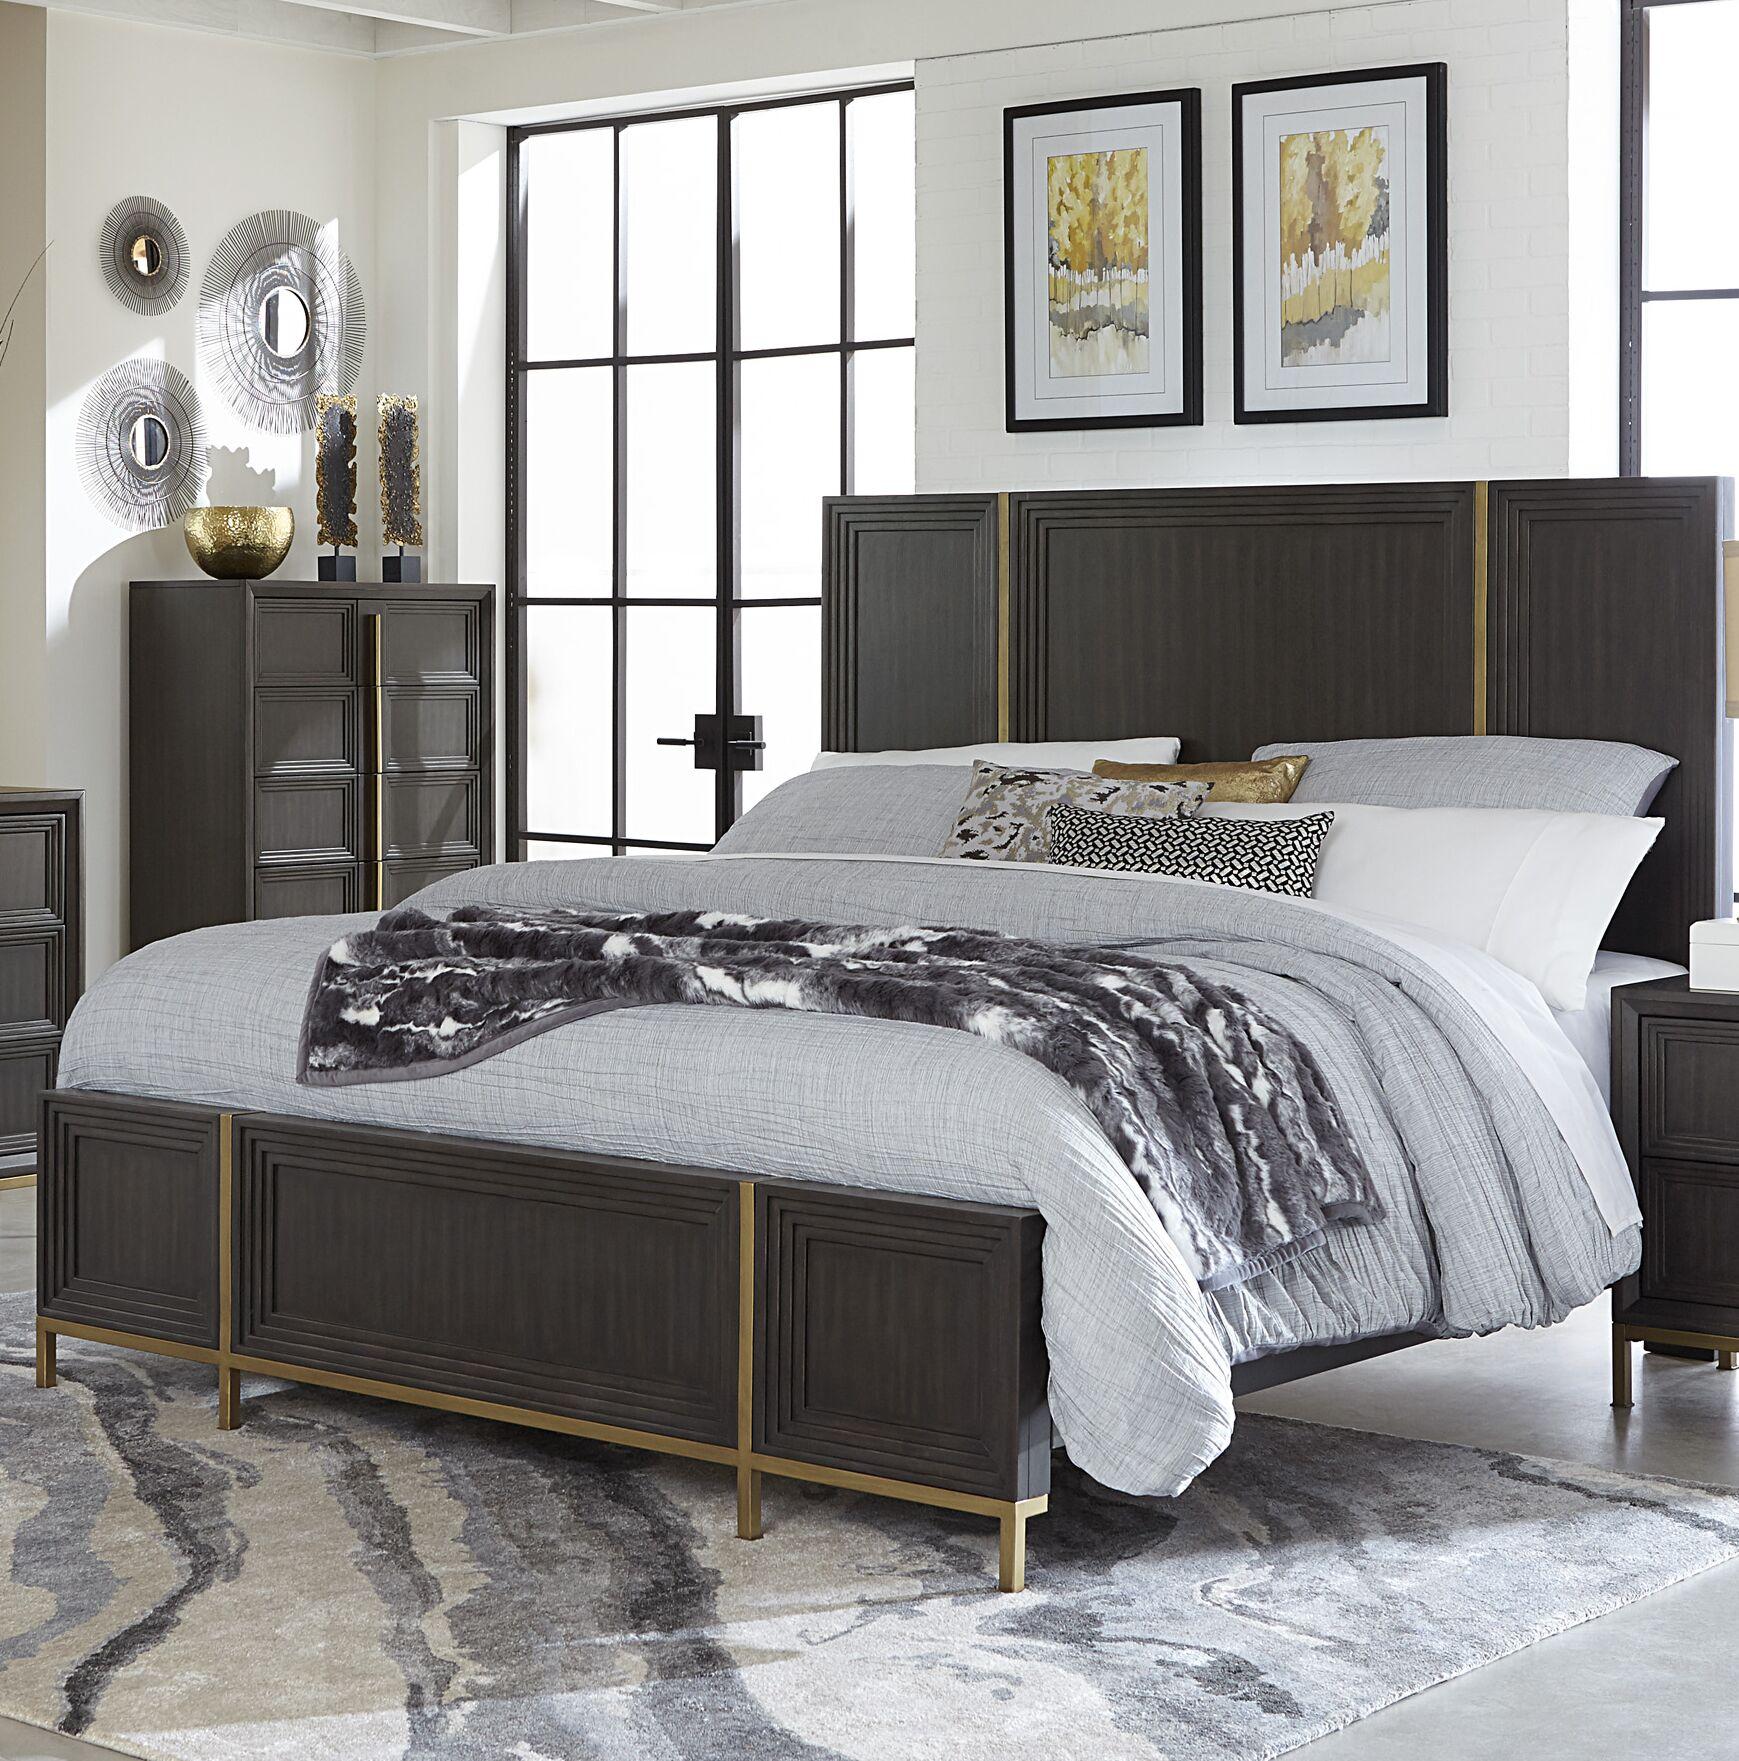 Anstett Panel Bed Size: King